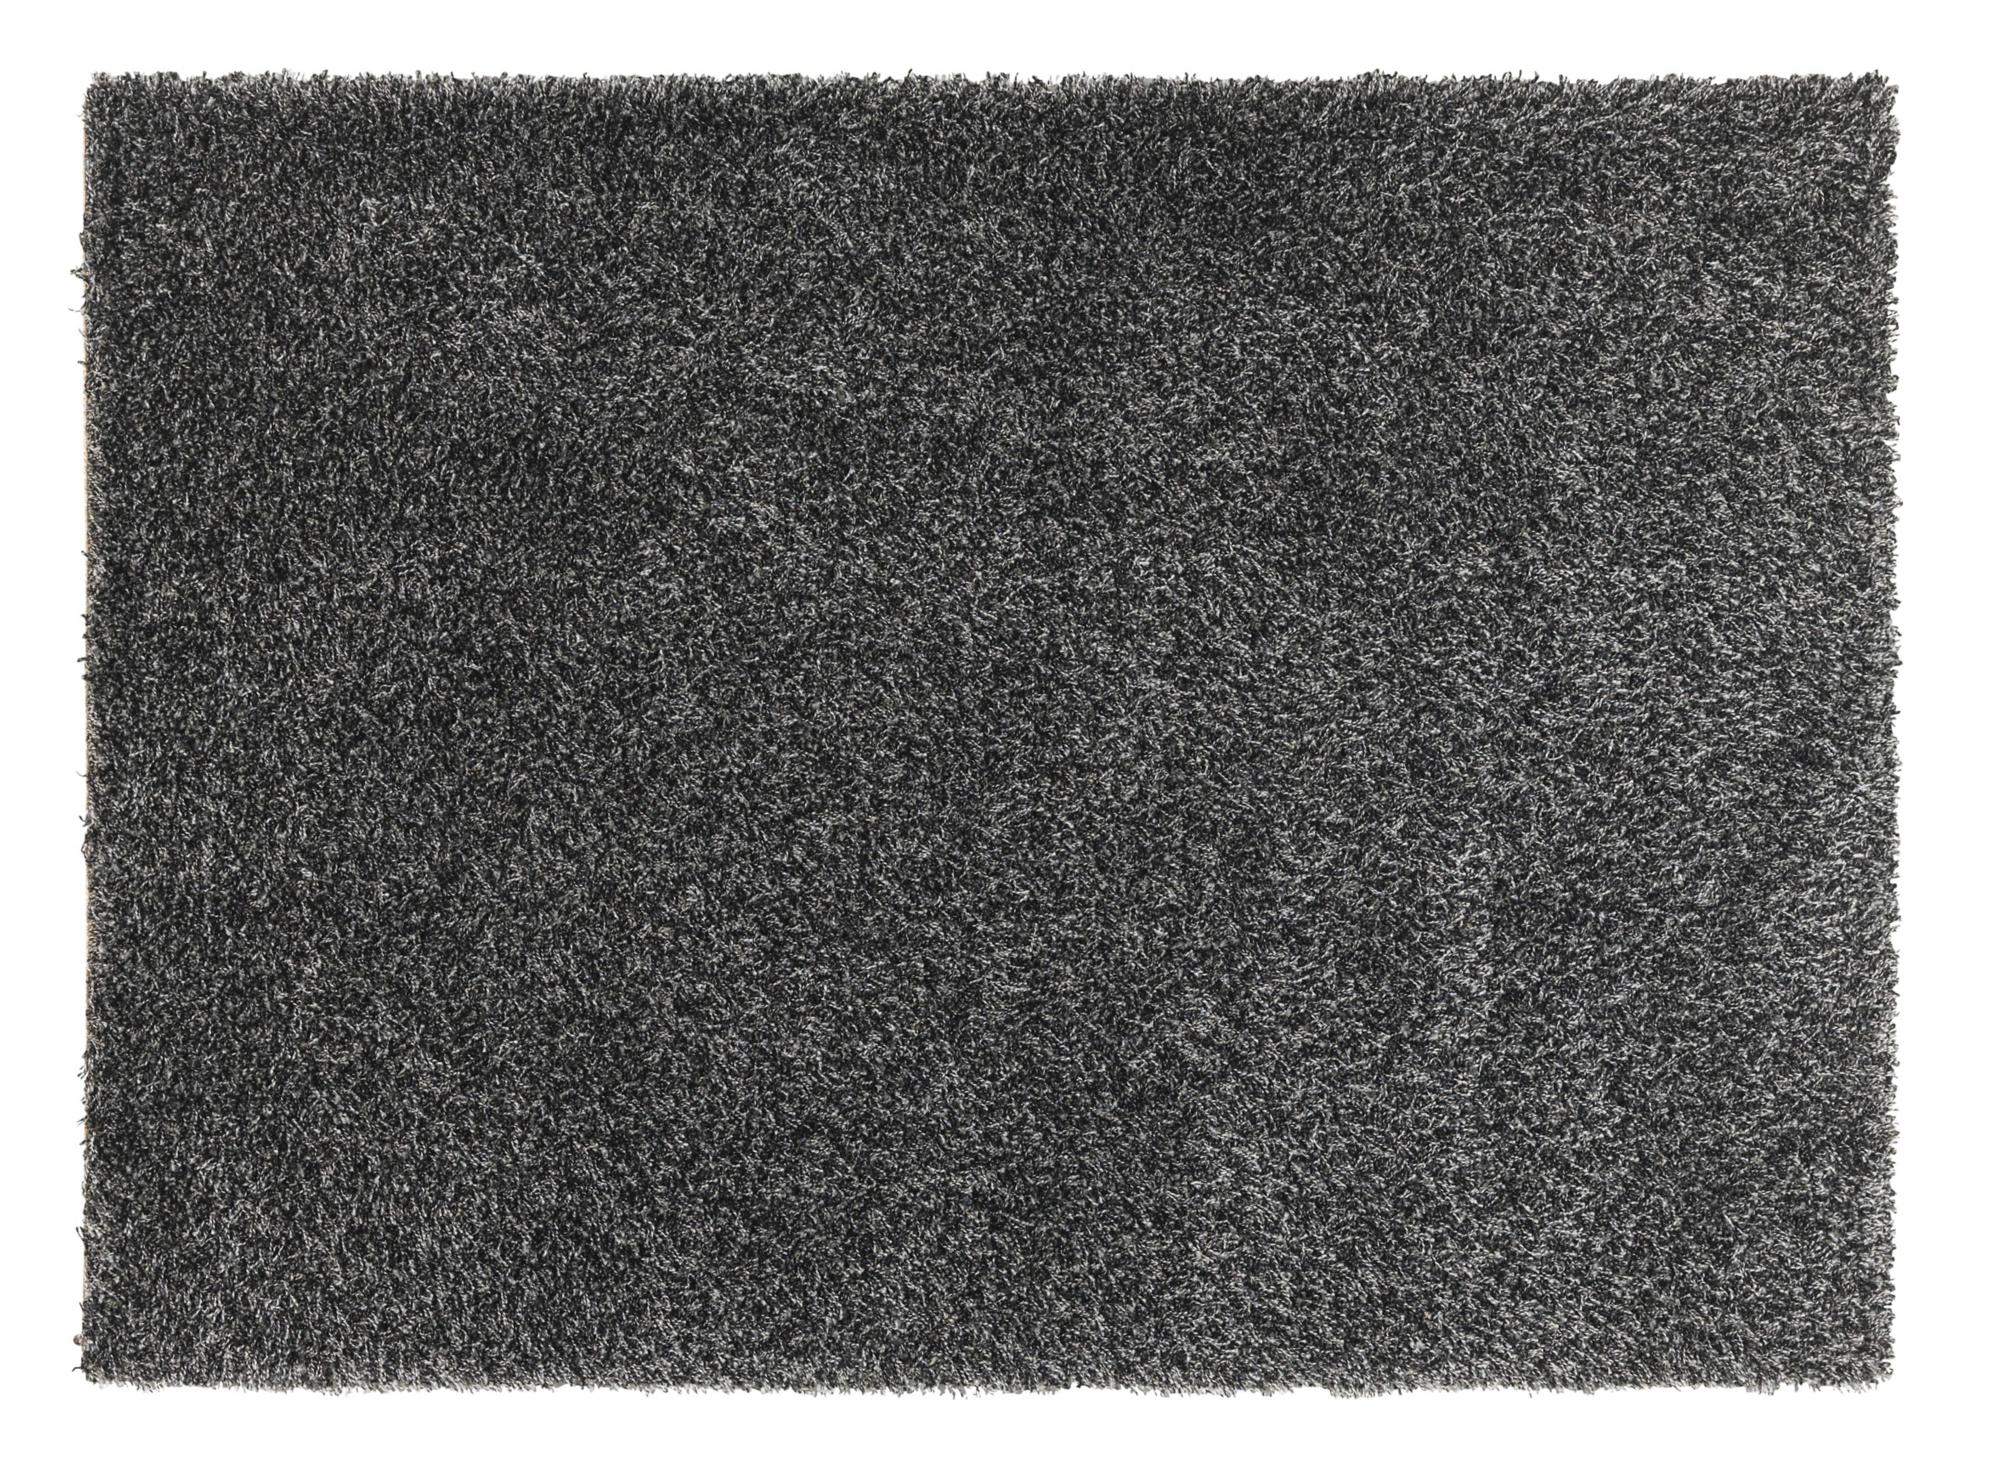 Tapis tisse mecanique 160x230 100% polypropylene dos 100% jute colori ...